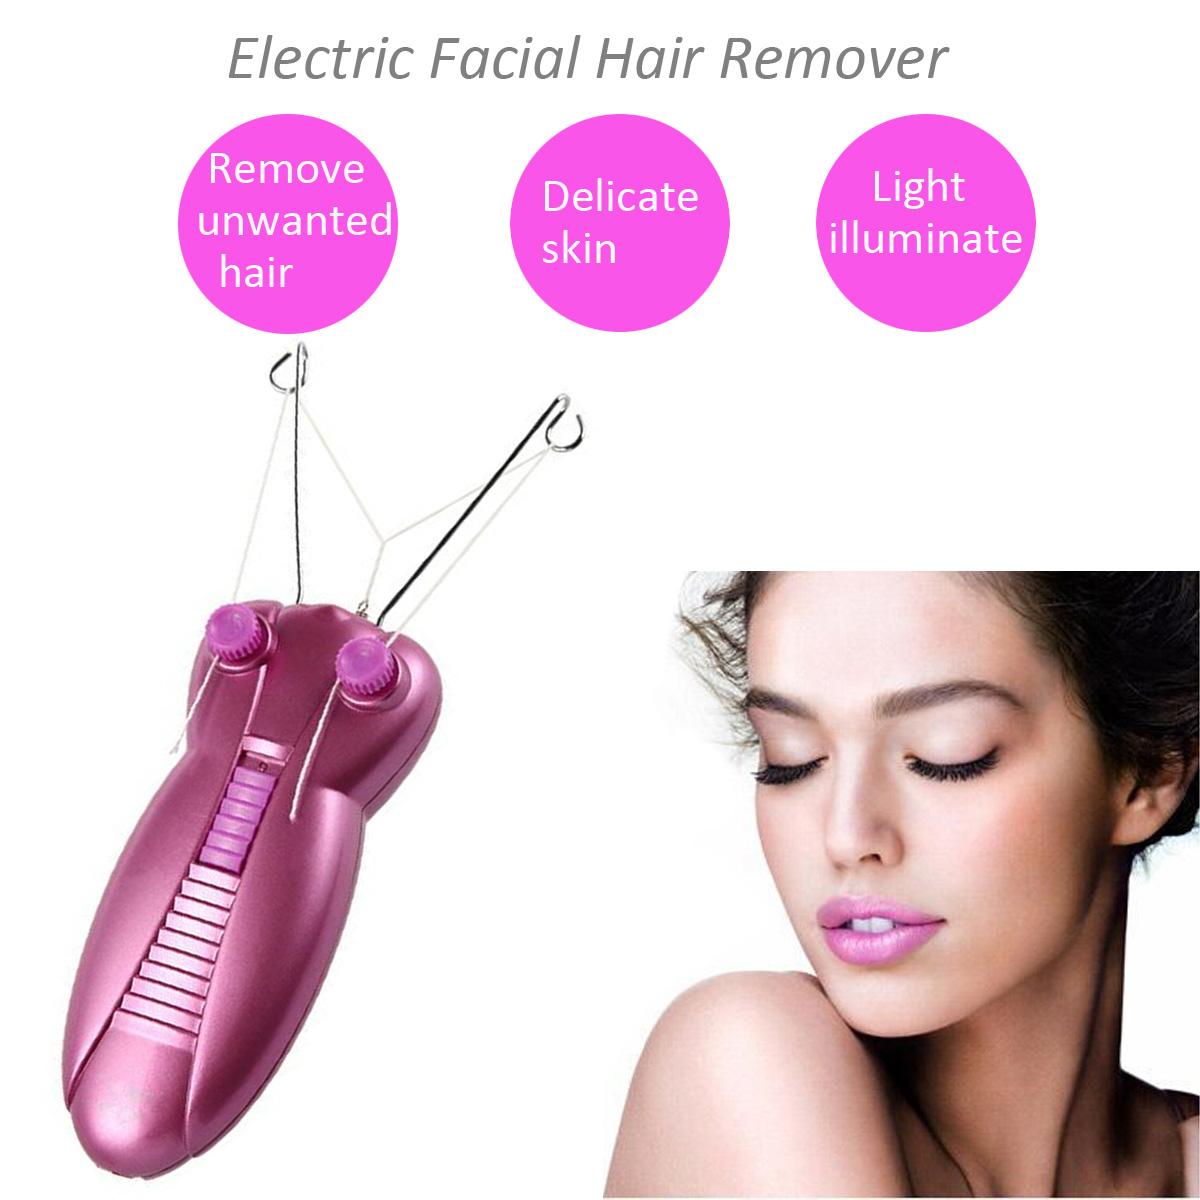 Facial hair removal malaysia